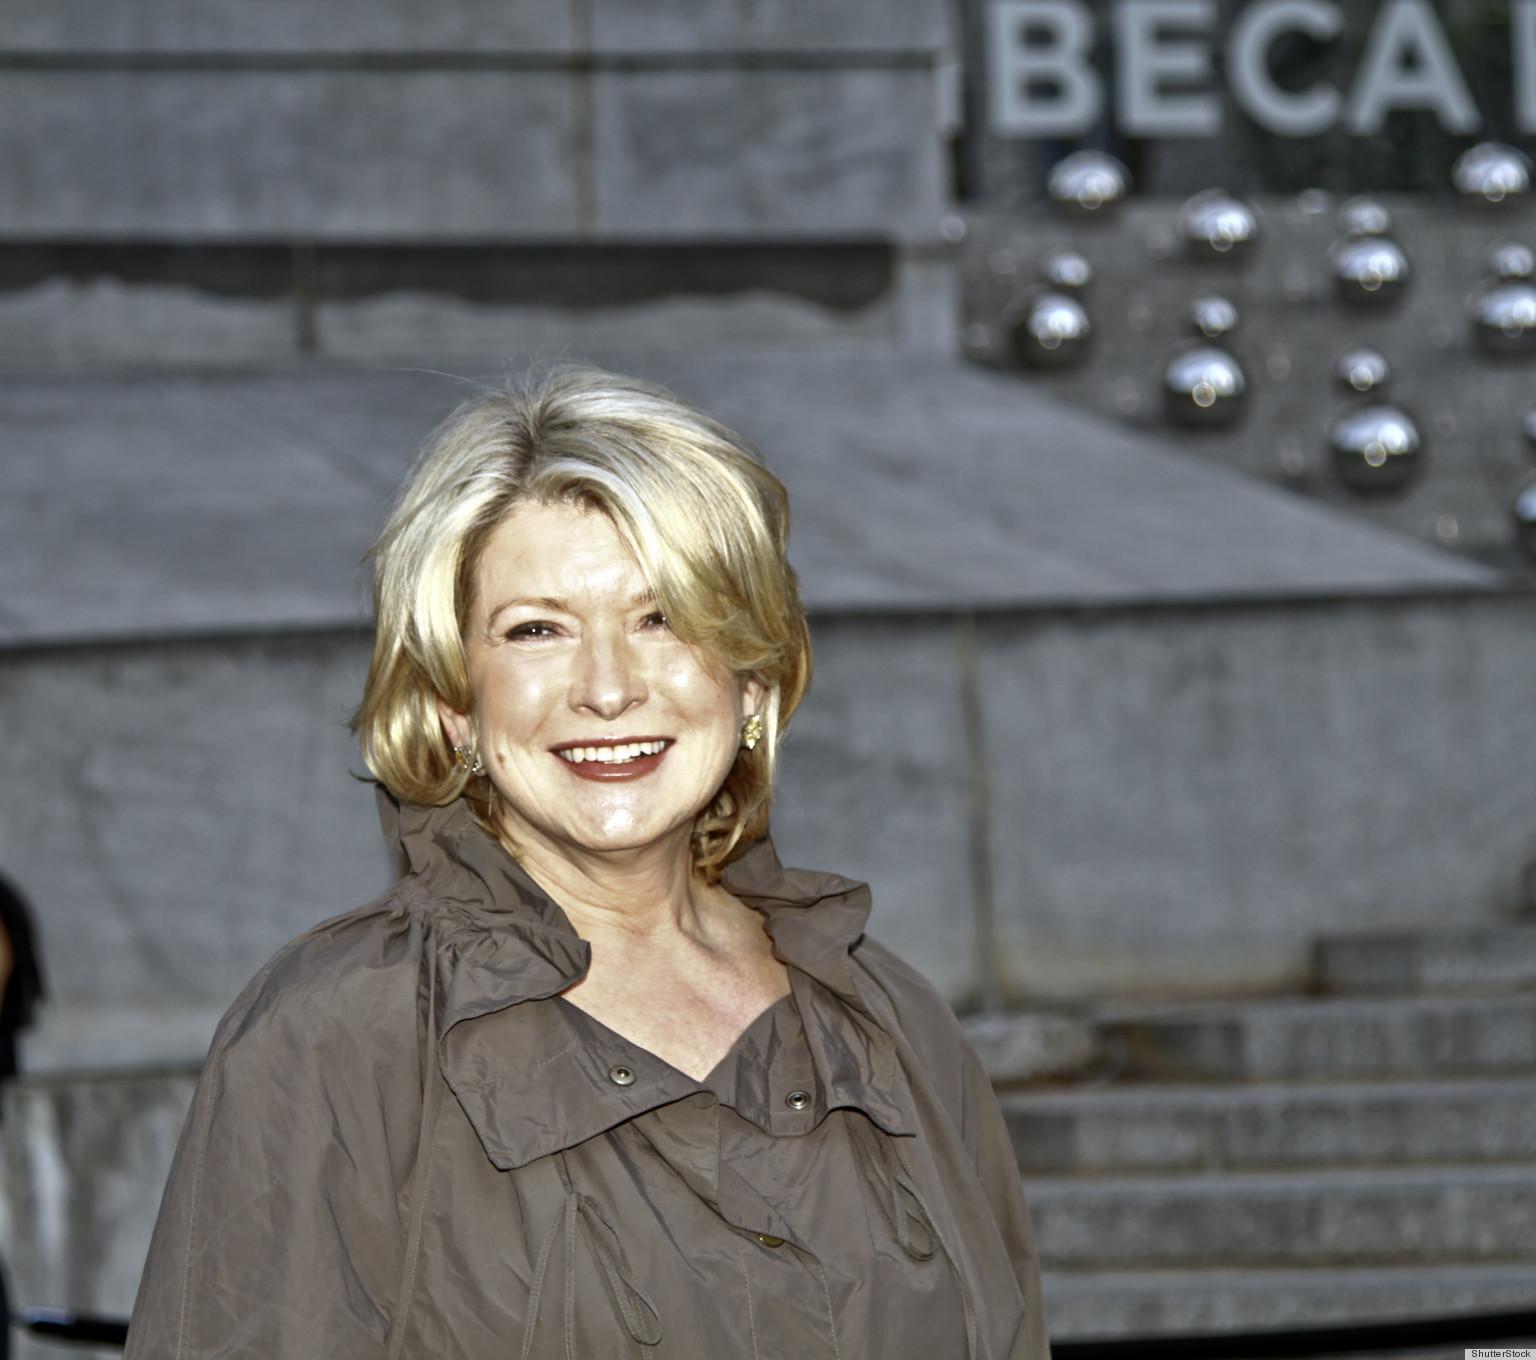 Martha Stewart: Martha Stewart Or Brit Morin's Crafts: Who Do You Prefer